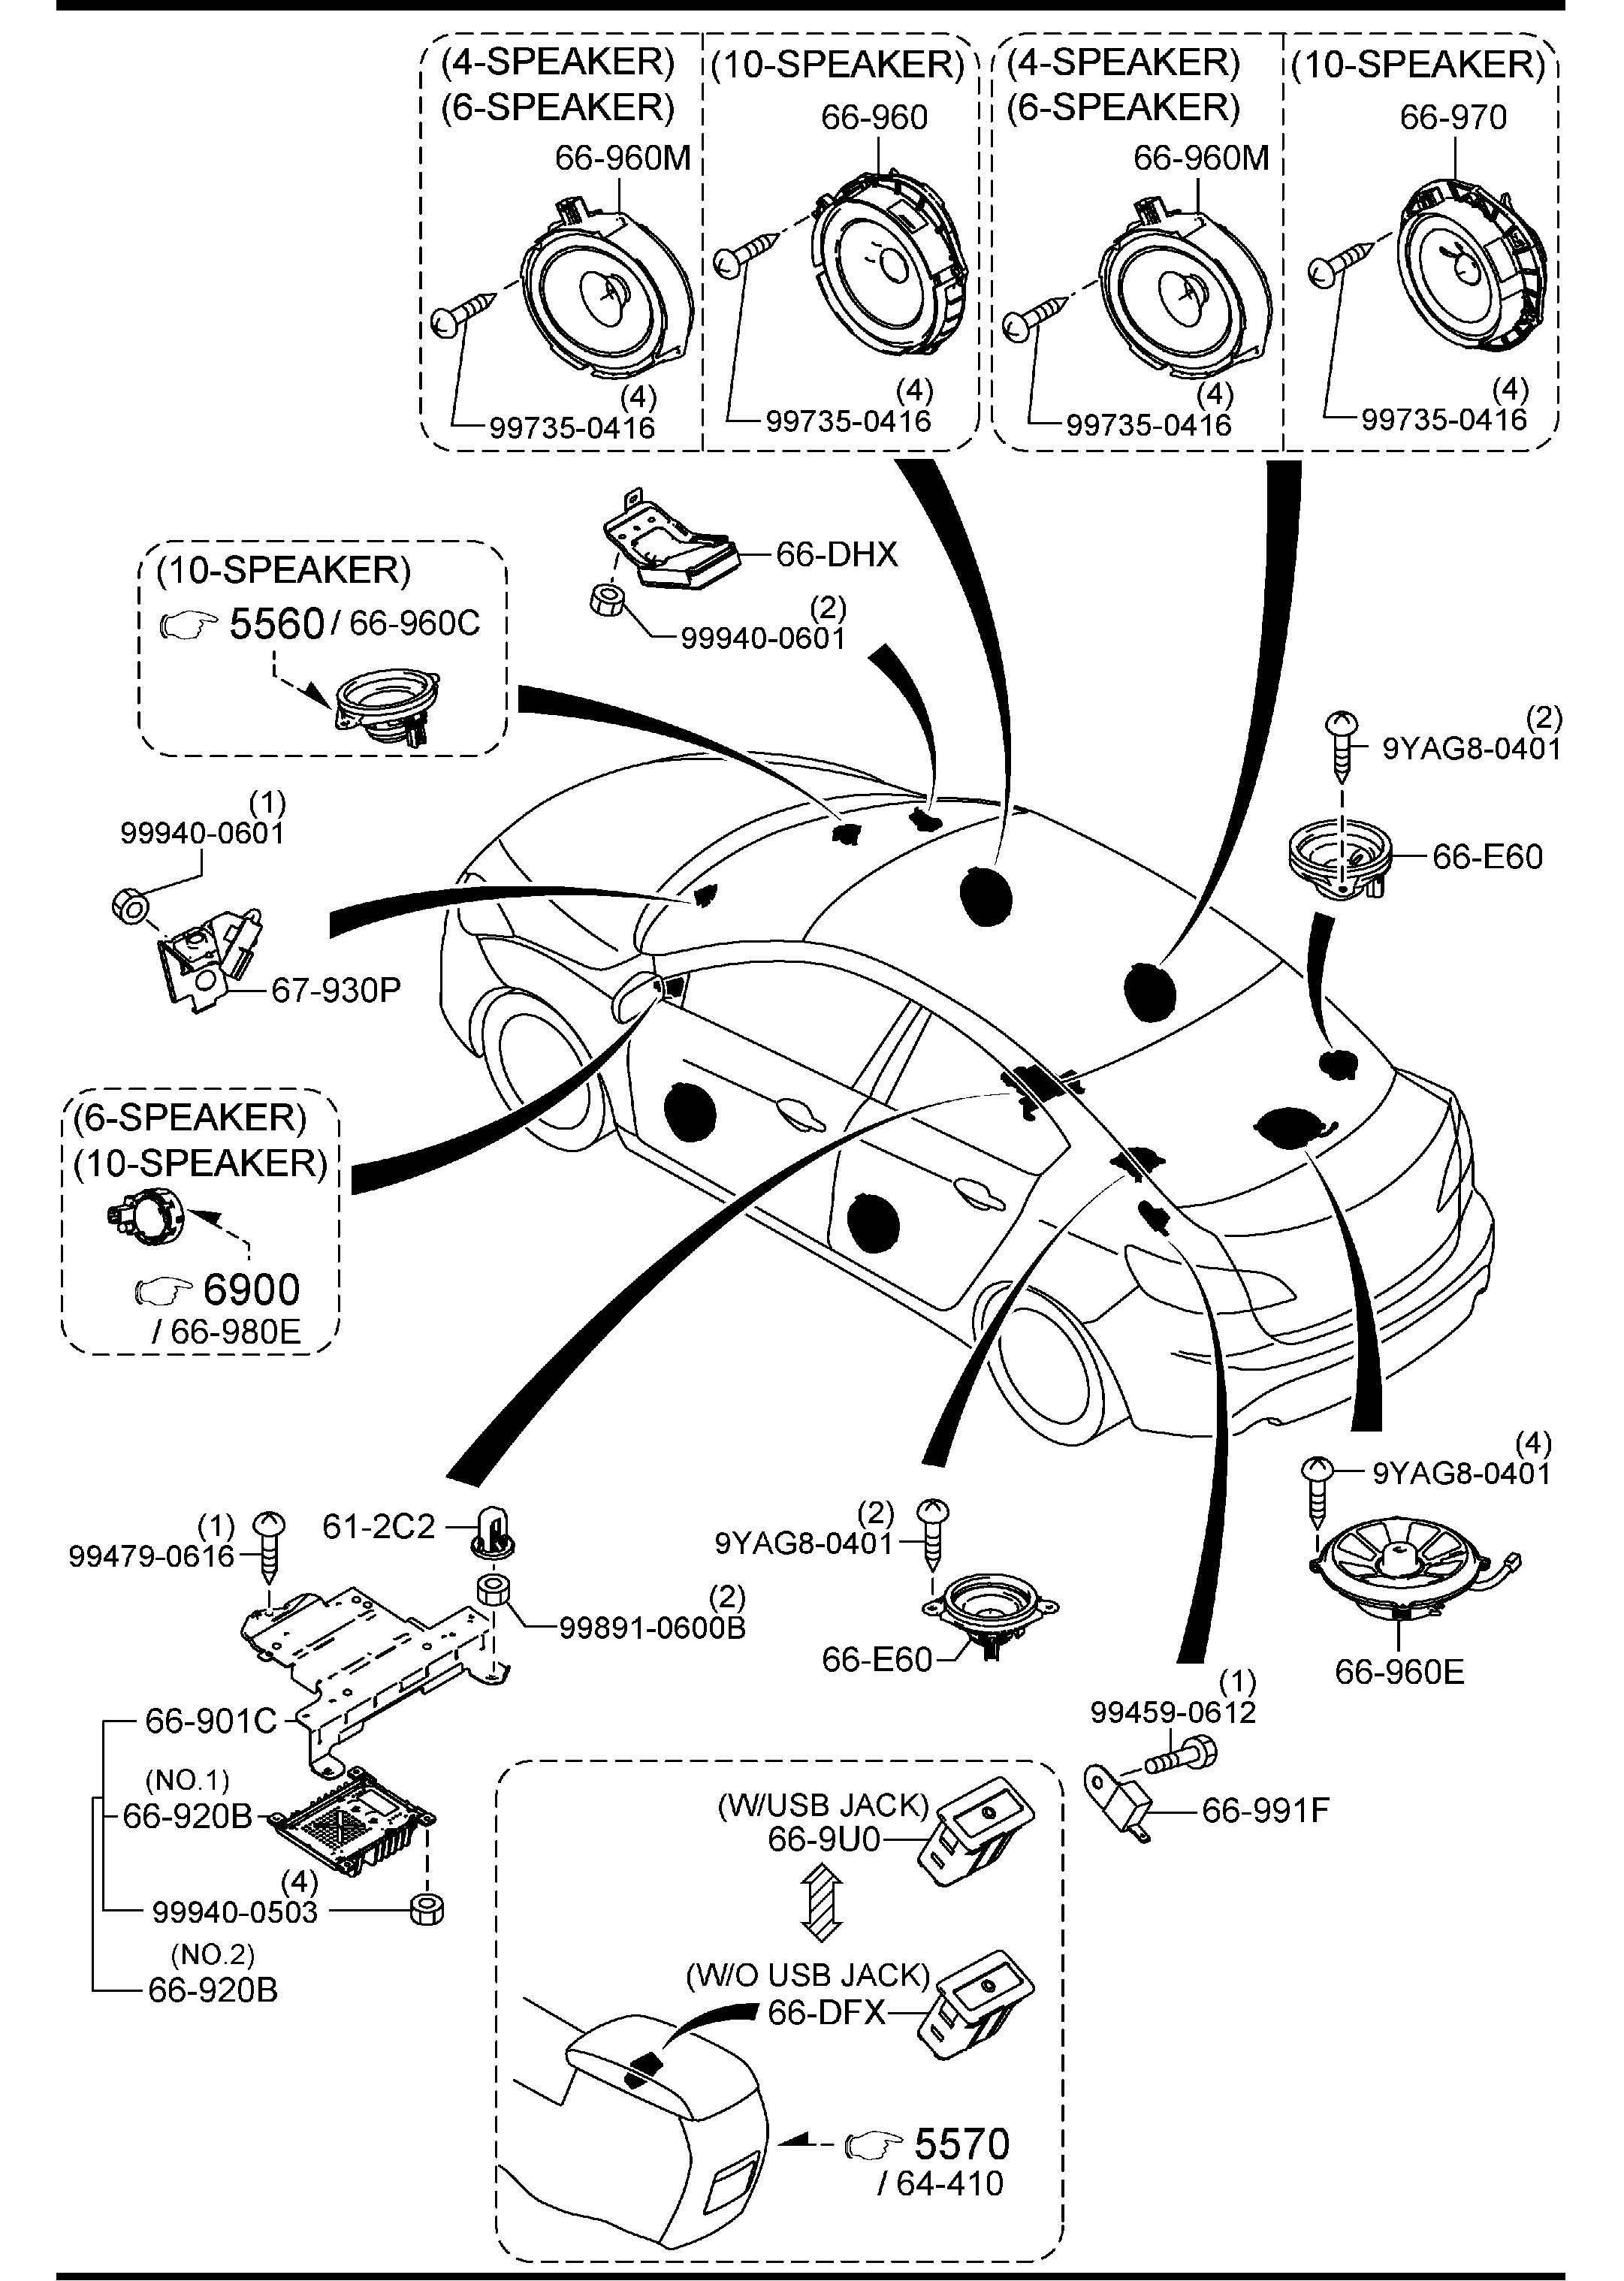 2013 Mazda Mazda 3 Adapter  Telephone  Wbluetooth